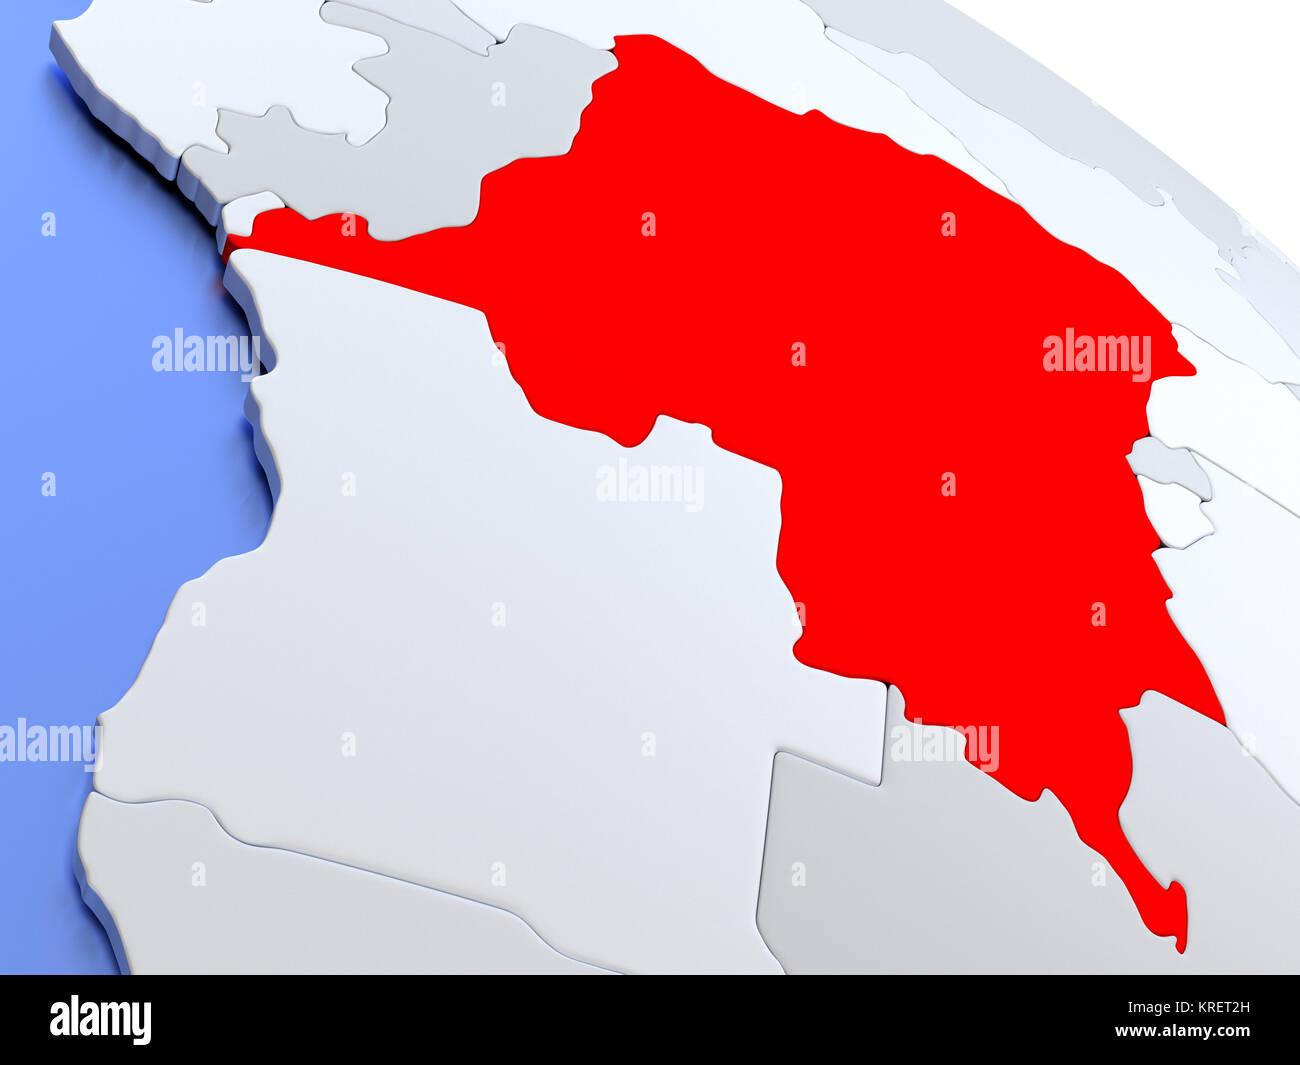 Democratic Republic Of Congo On World Map Stock Photo 169356617 Alamy